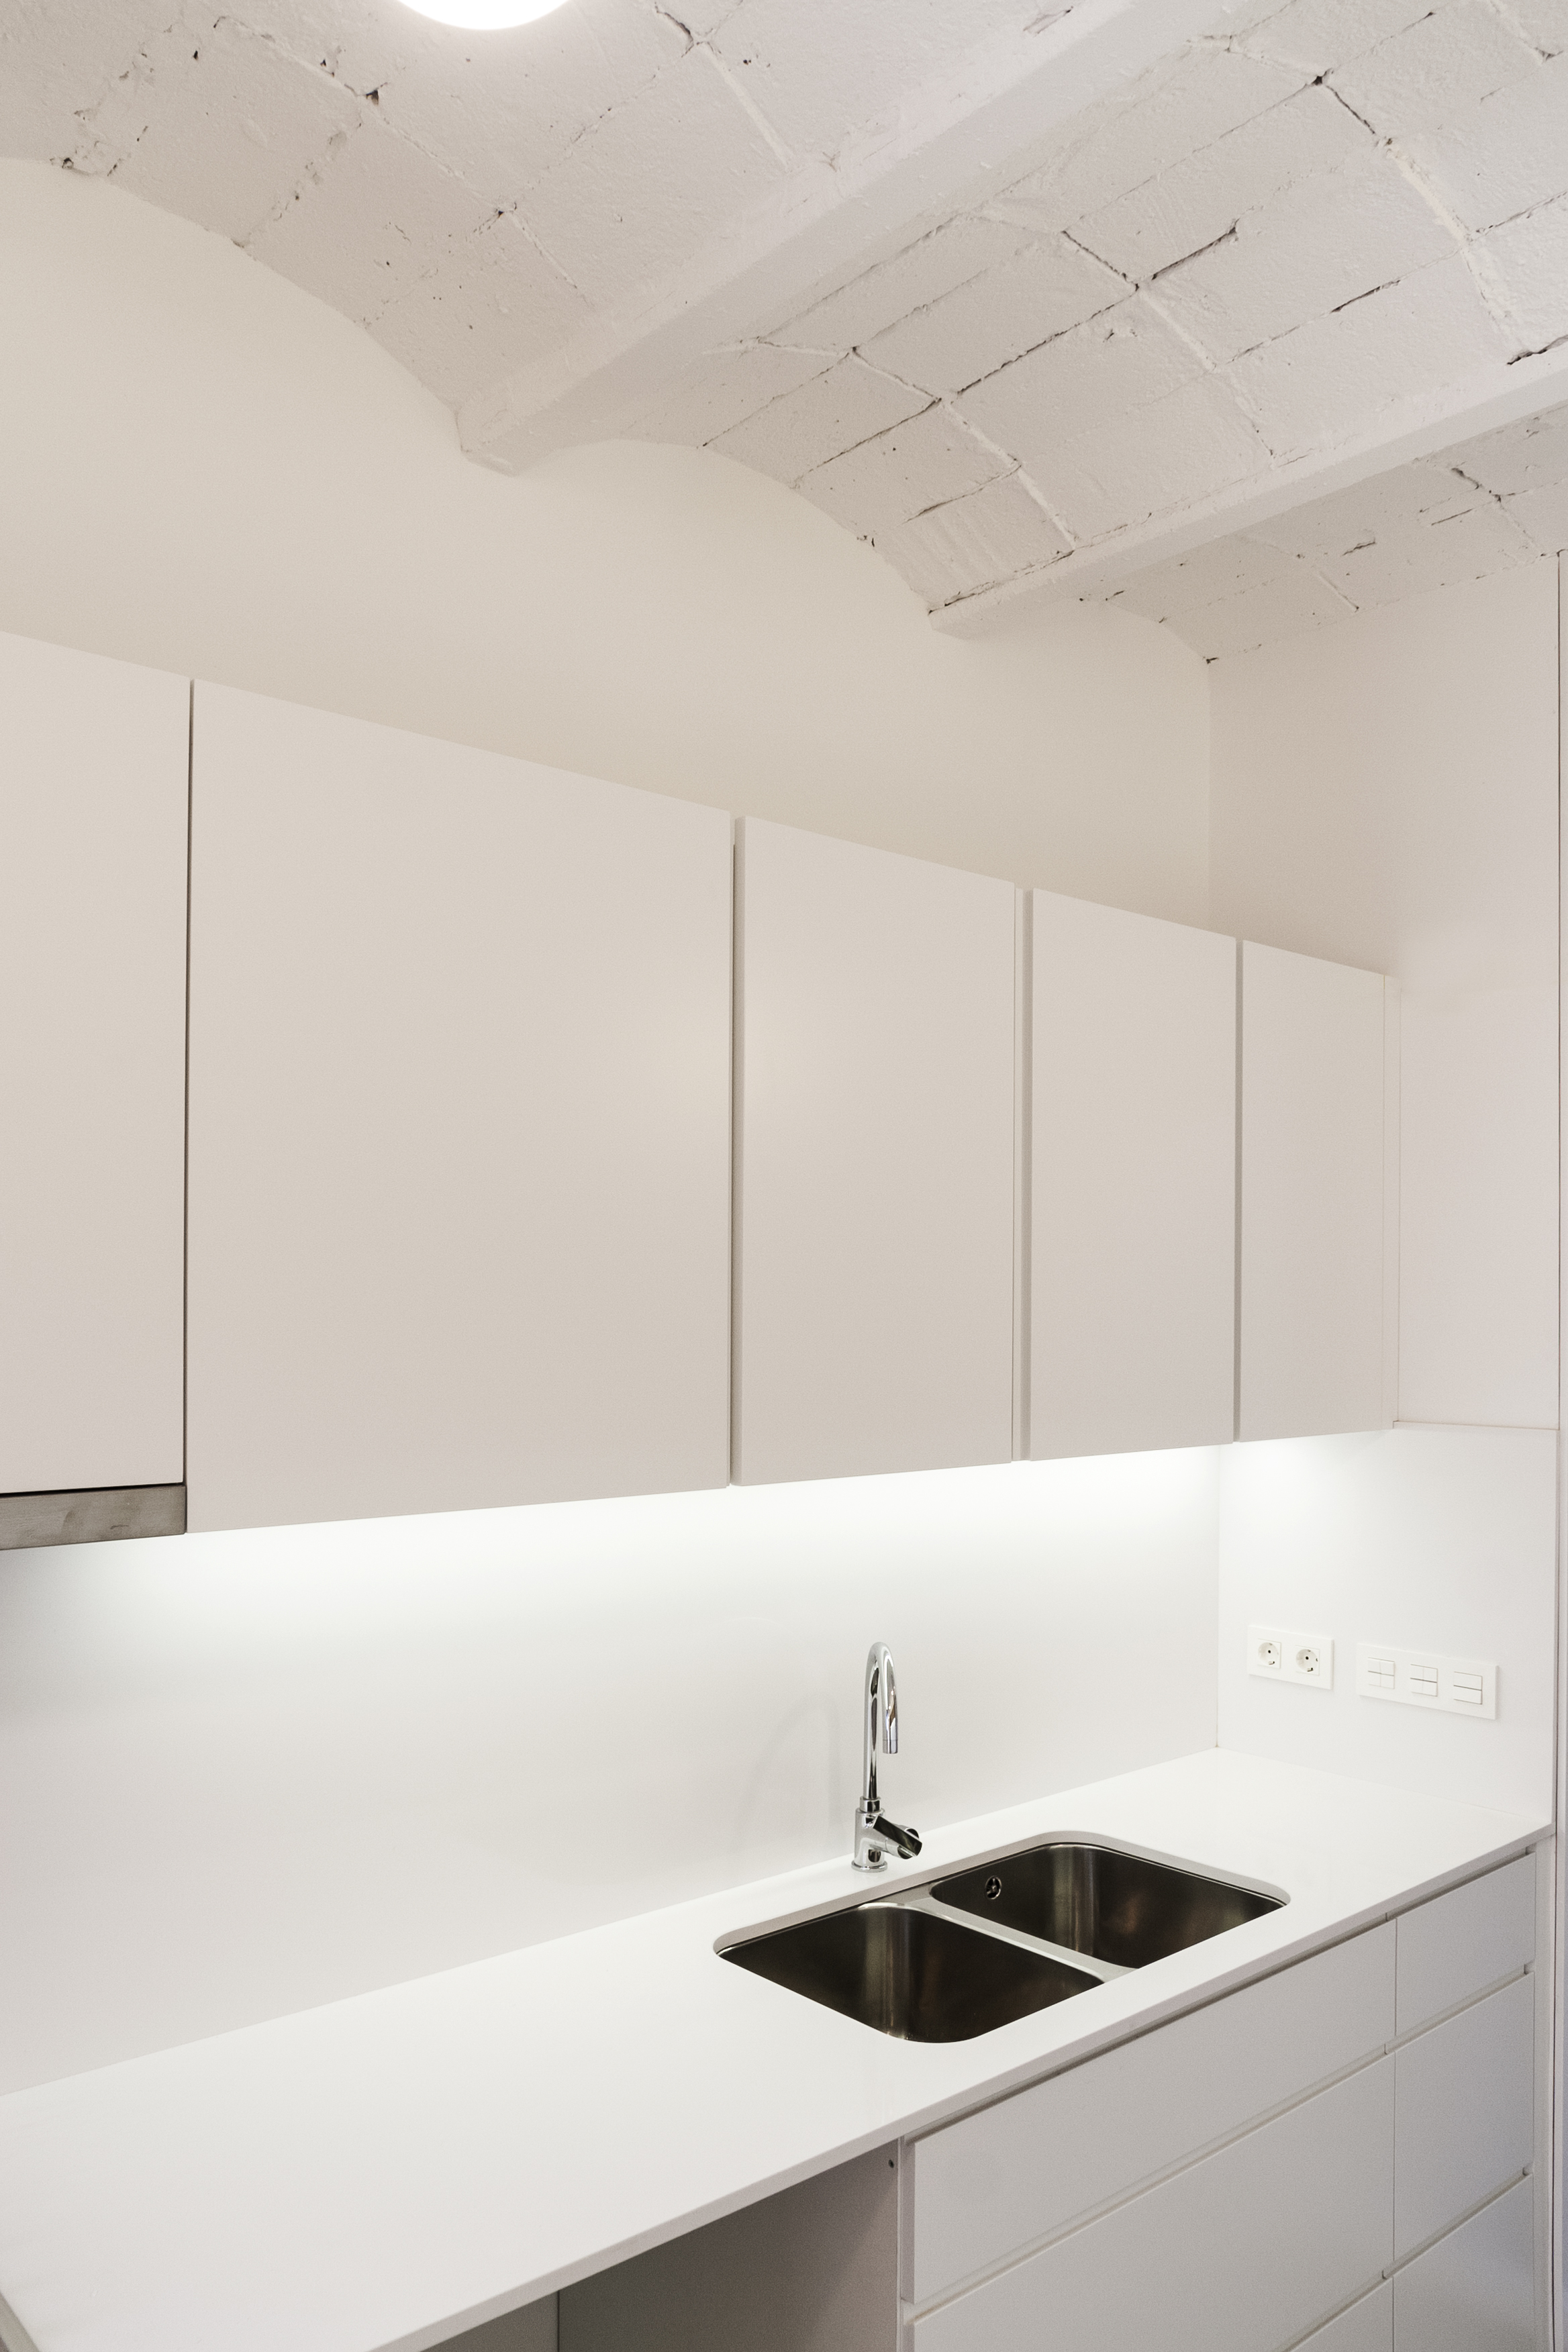 Sala Ferusic Architects Mas Yebra Carles Sala Relja Ferusic